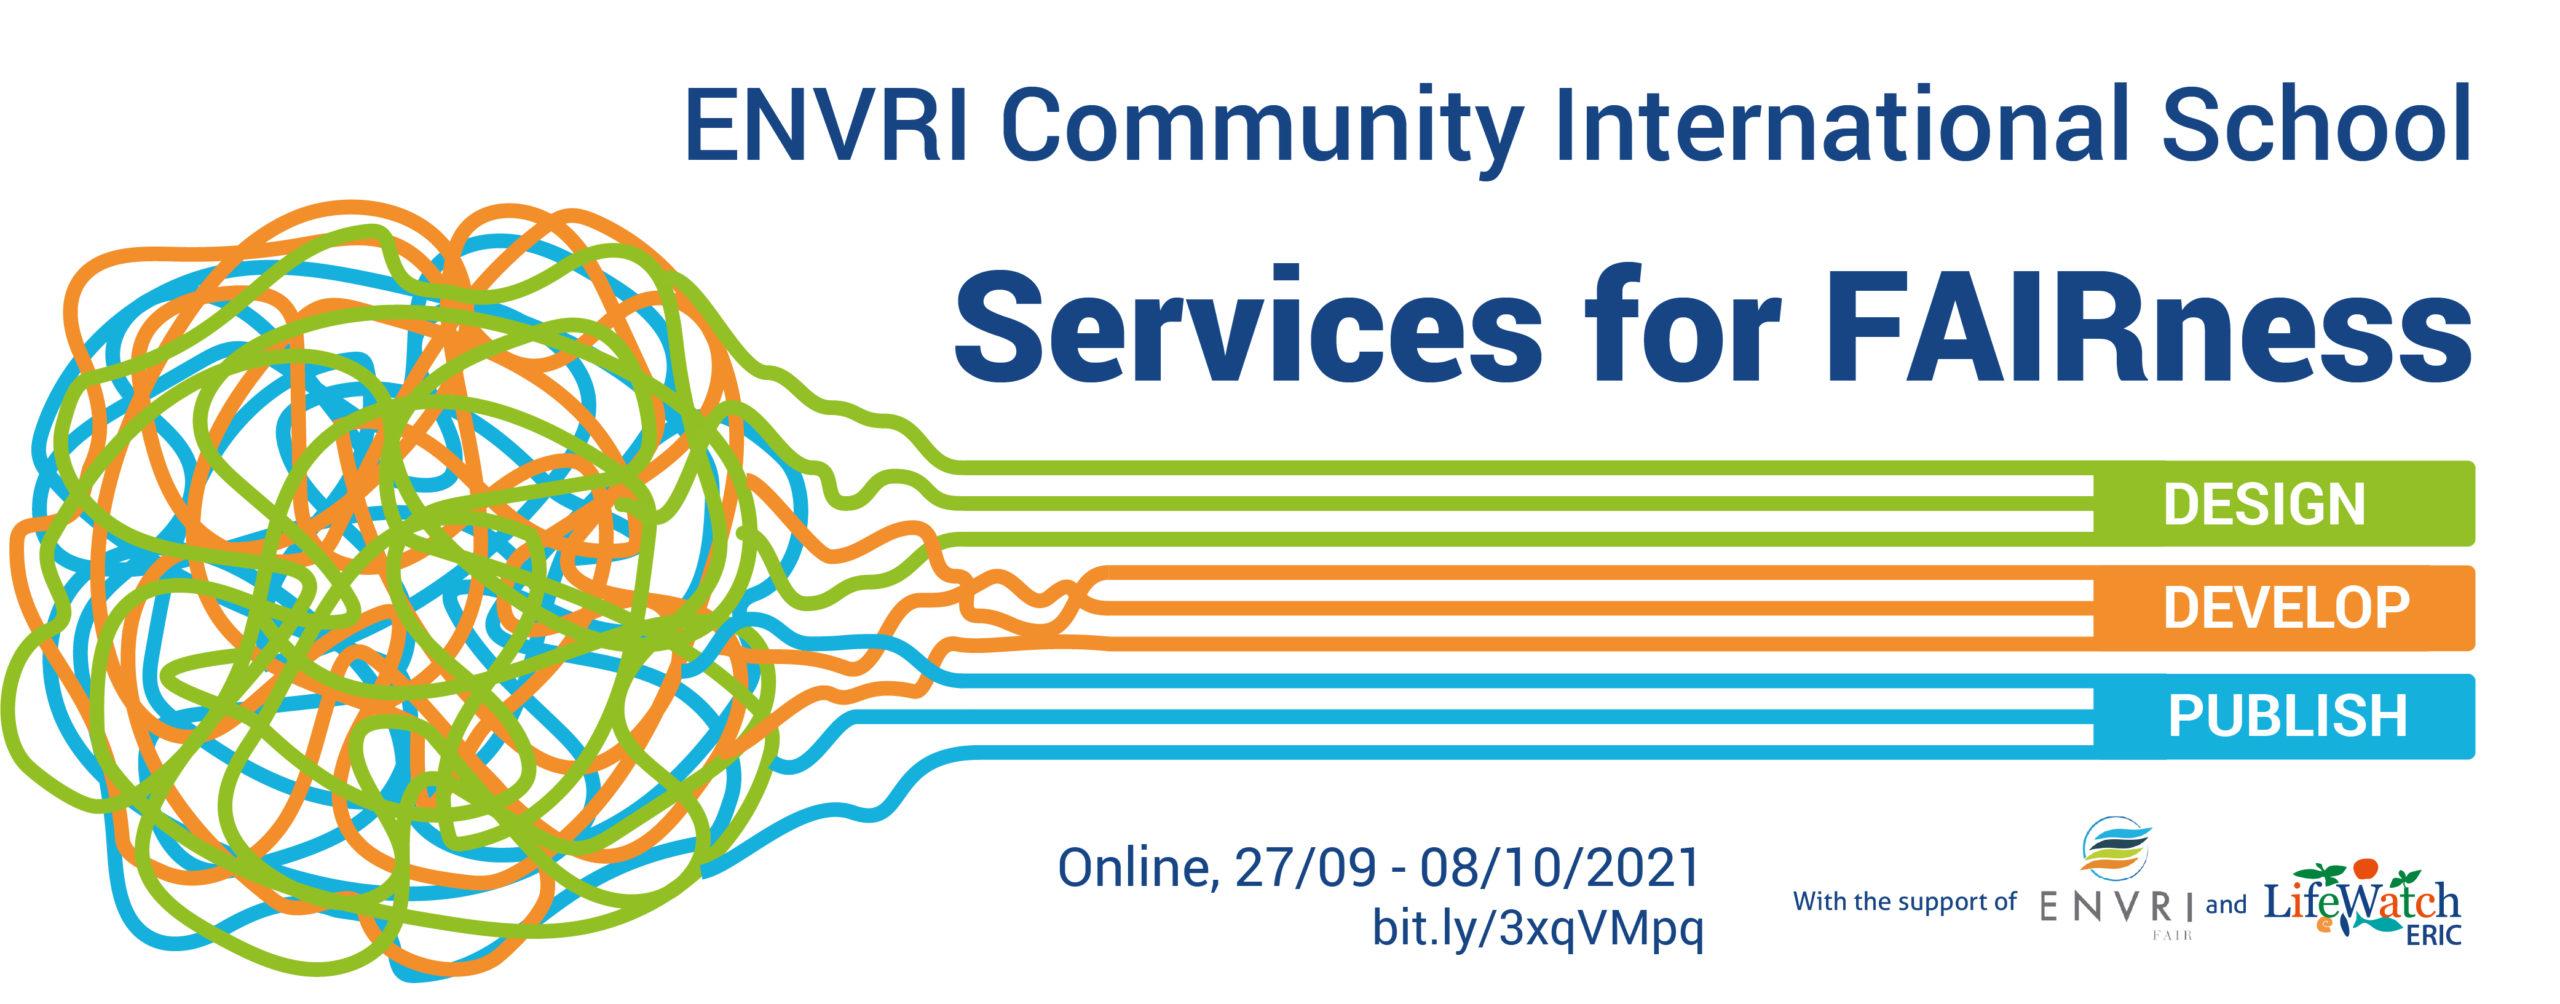 The 2021 ENVRI Community International School